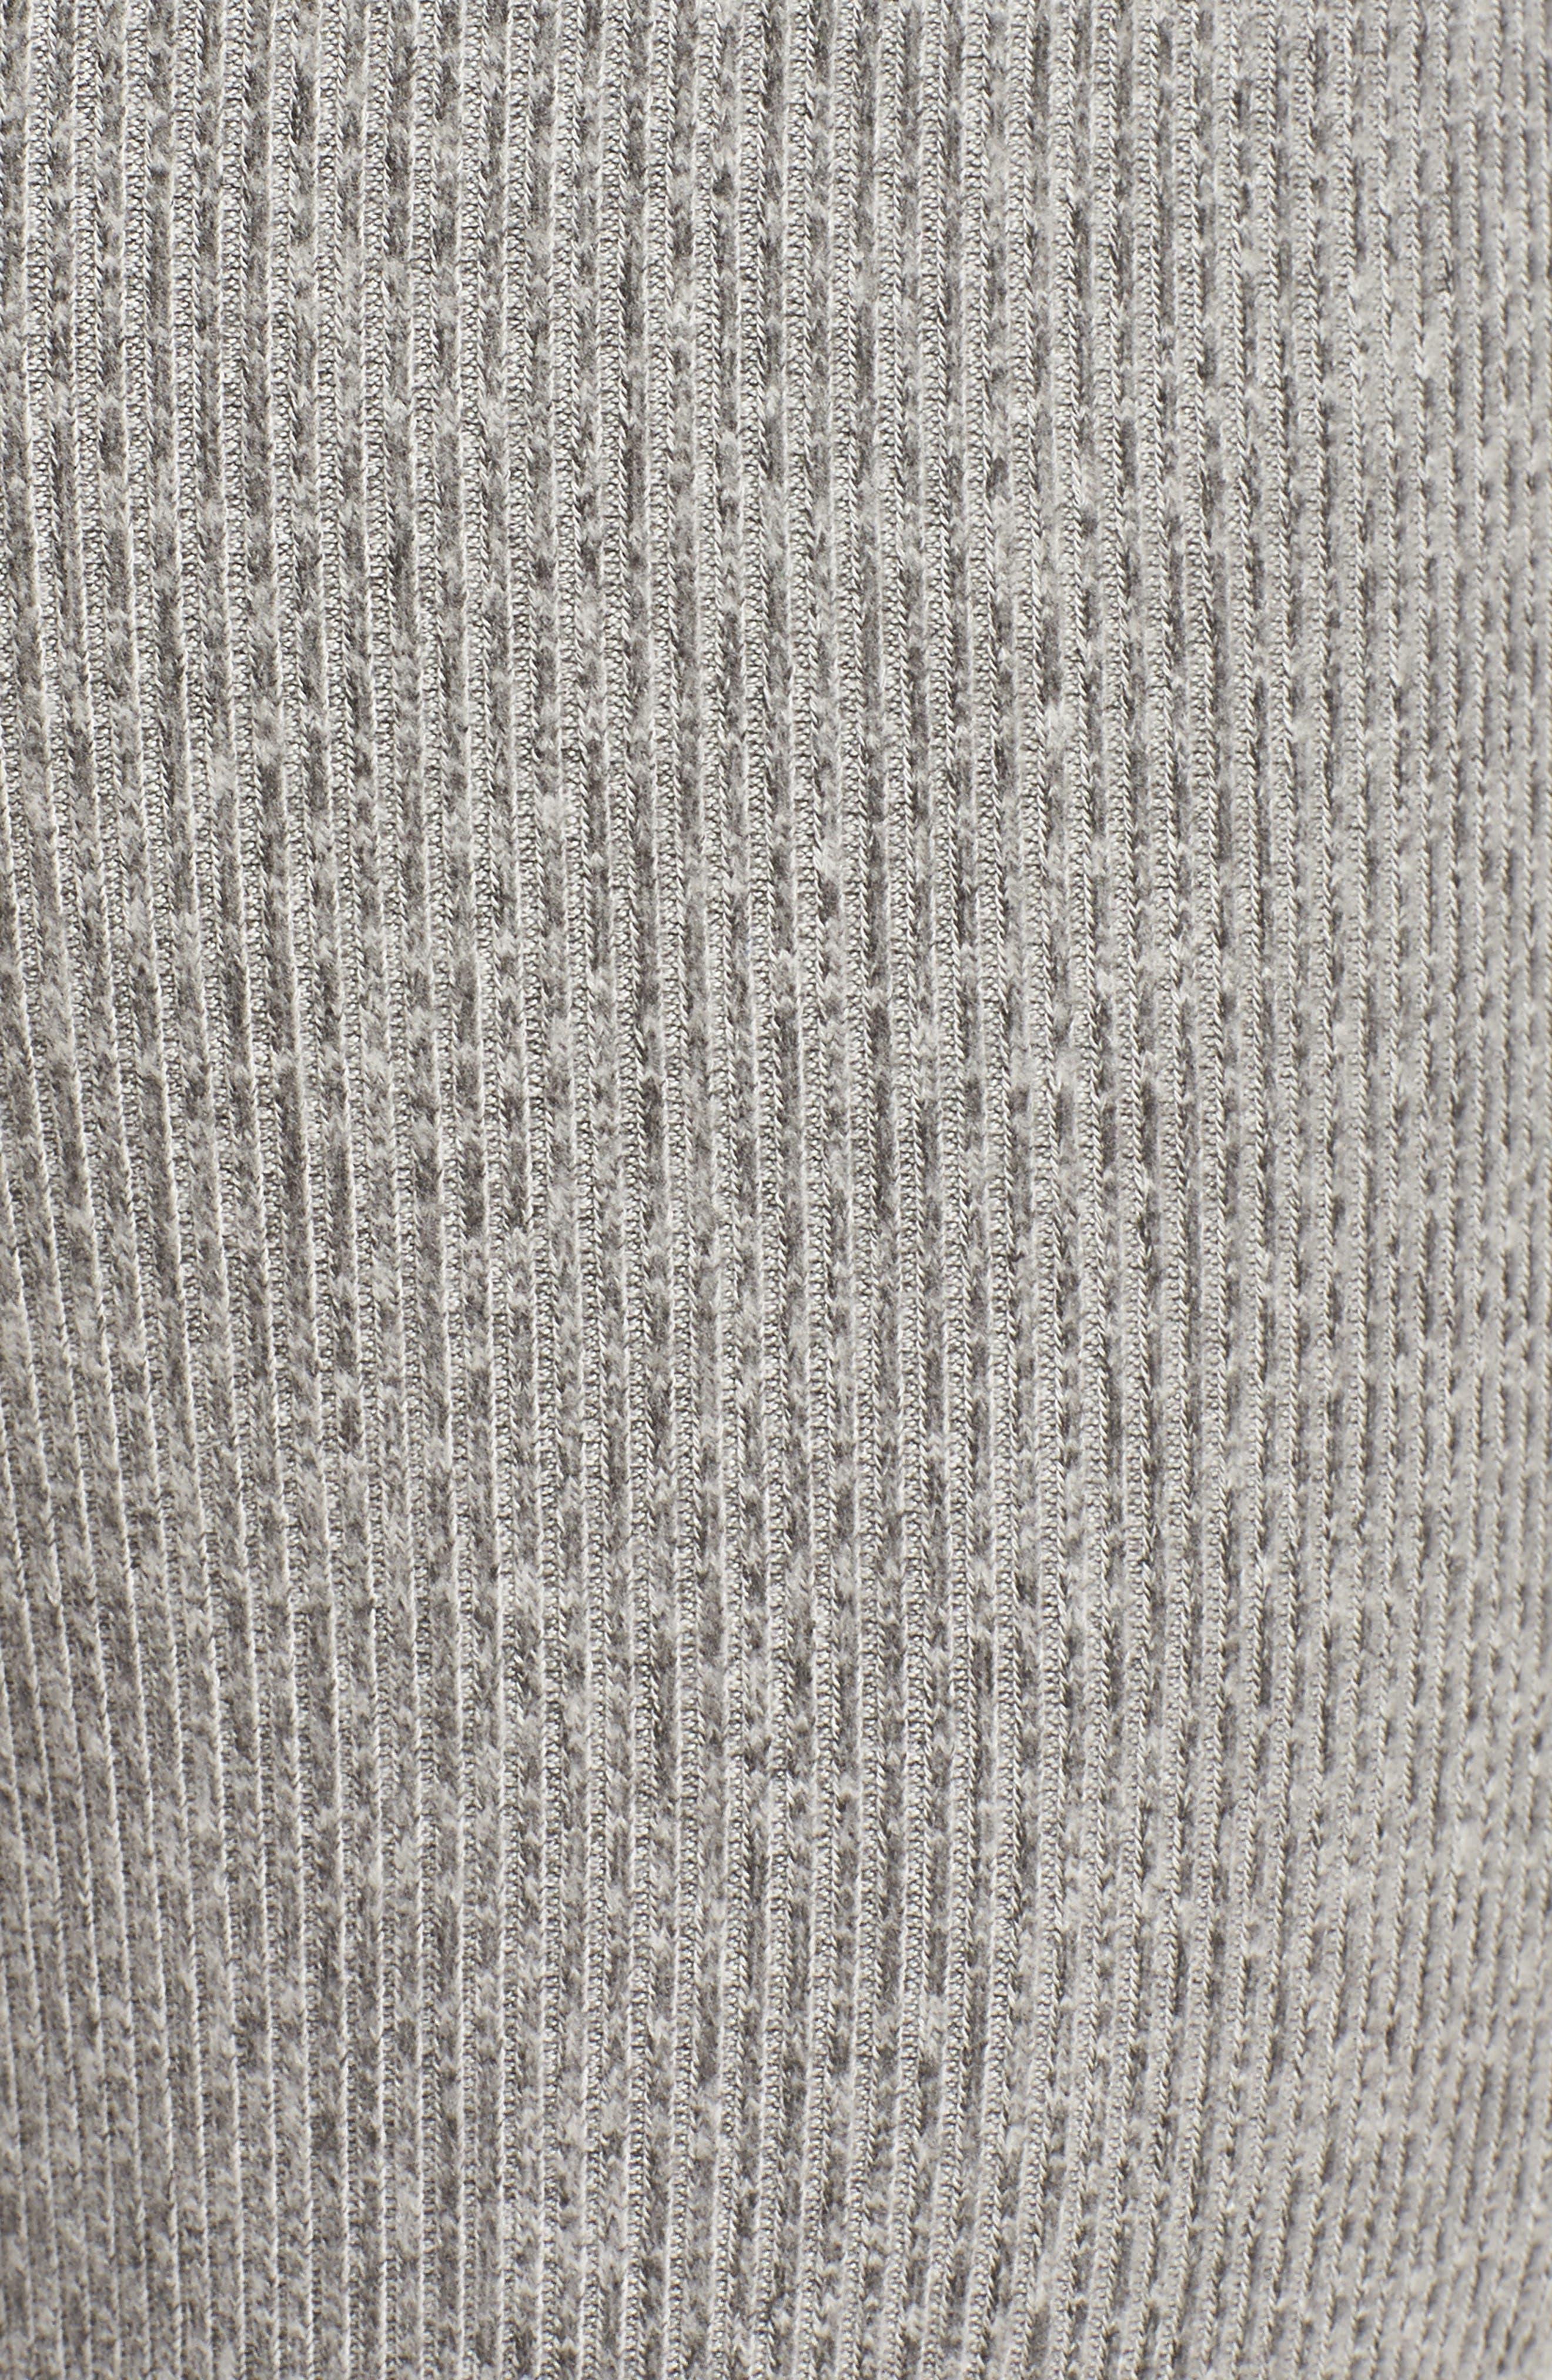 Knit Lounge Pants,                             Alternate thumbnail 5, color,                             020